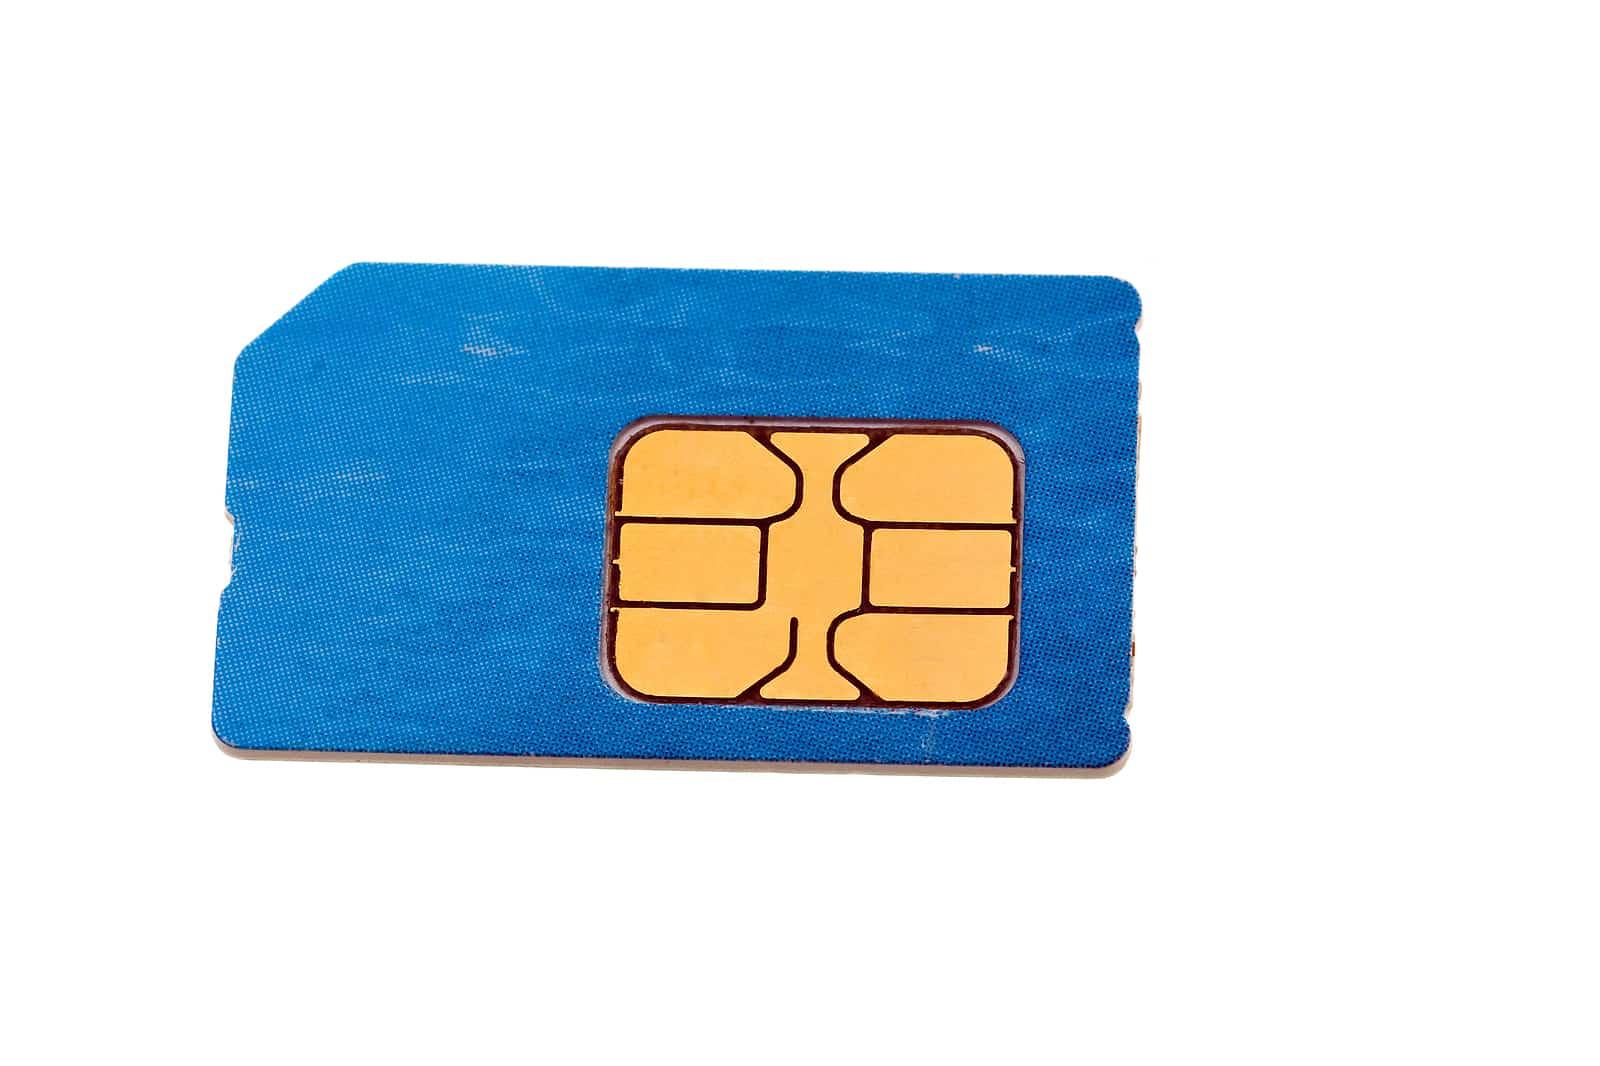 How hackers swap SIM cards